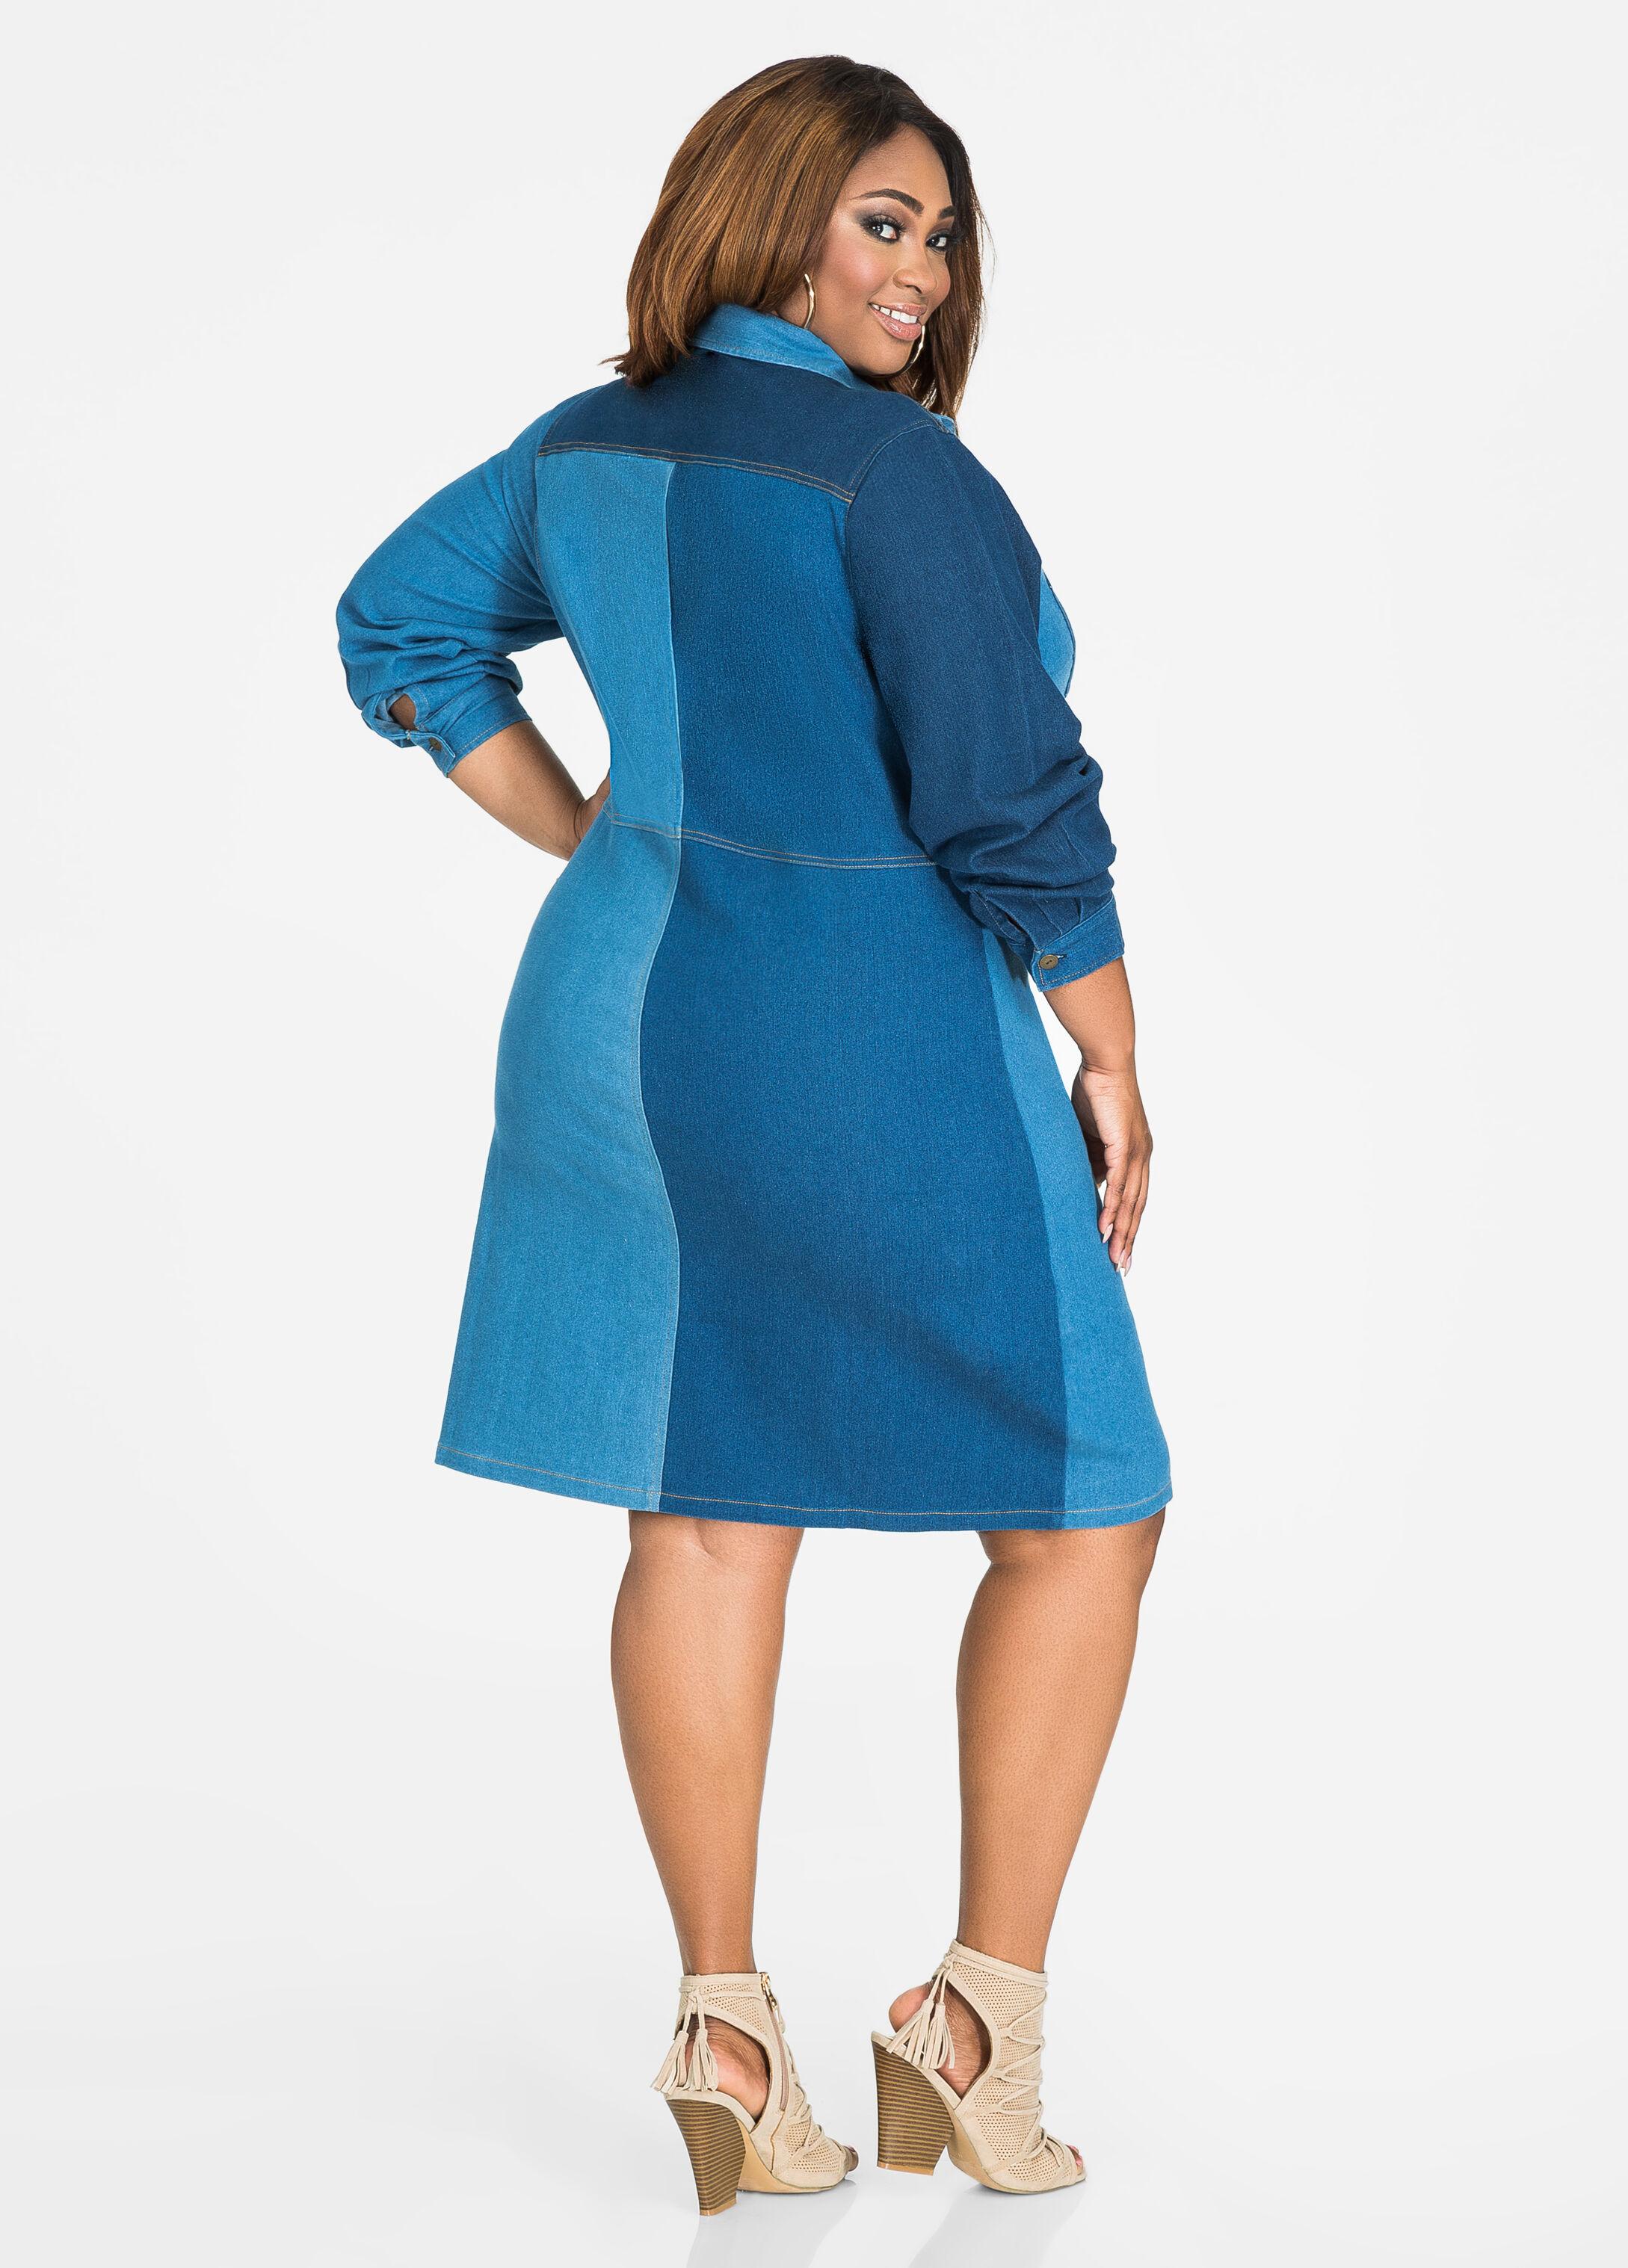 Patchwork Denim Studded Dress